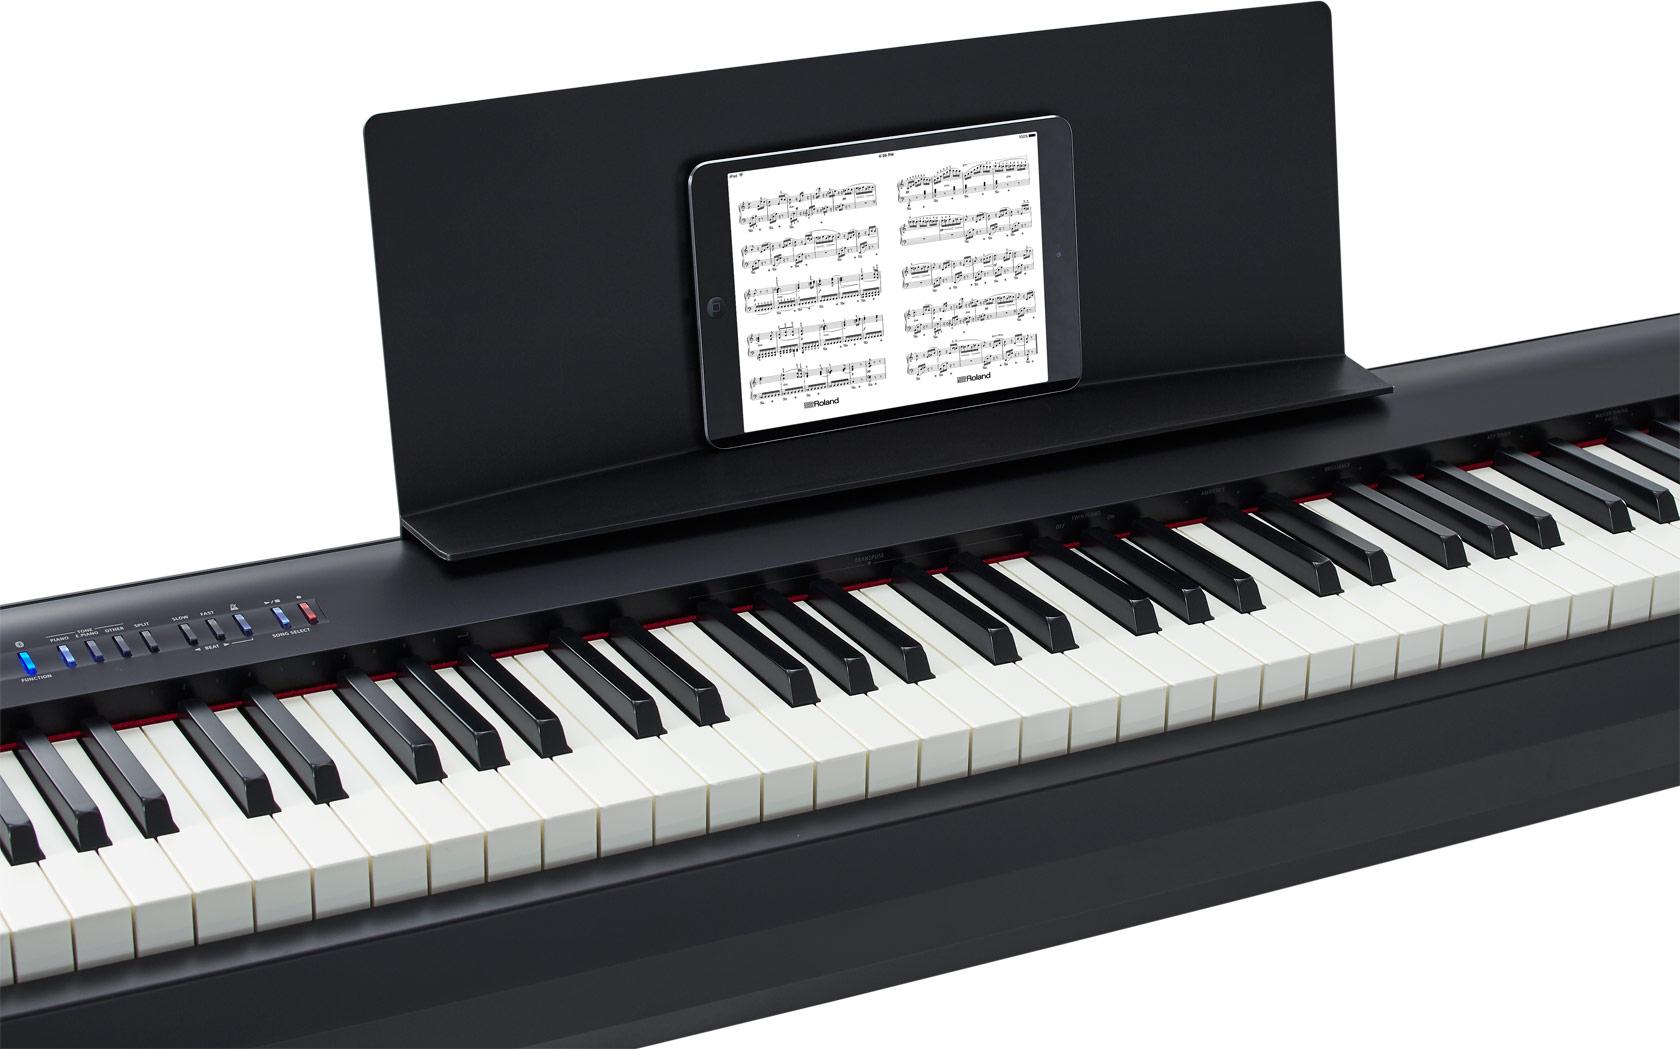 Keys of Roland FP-30